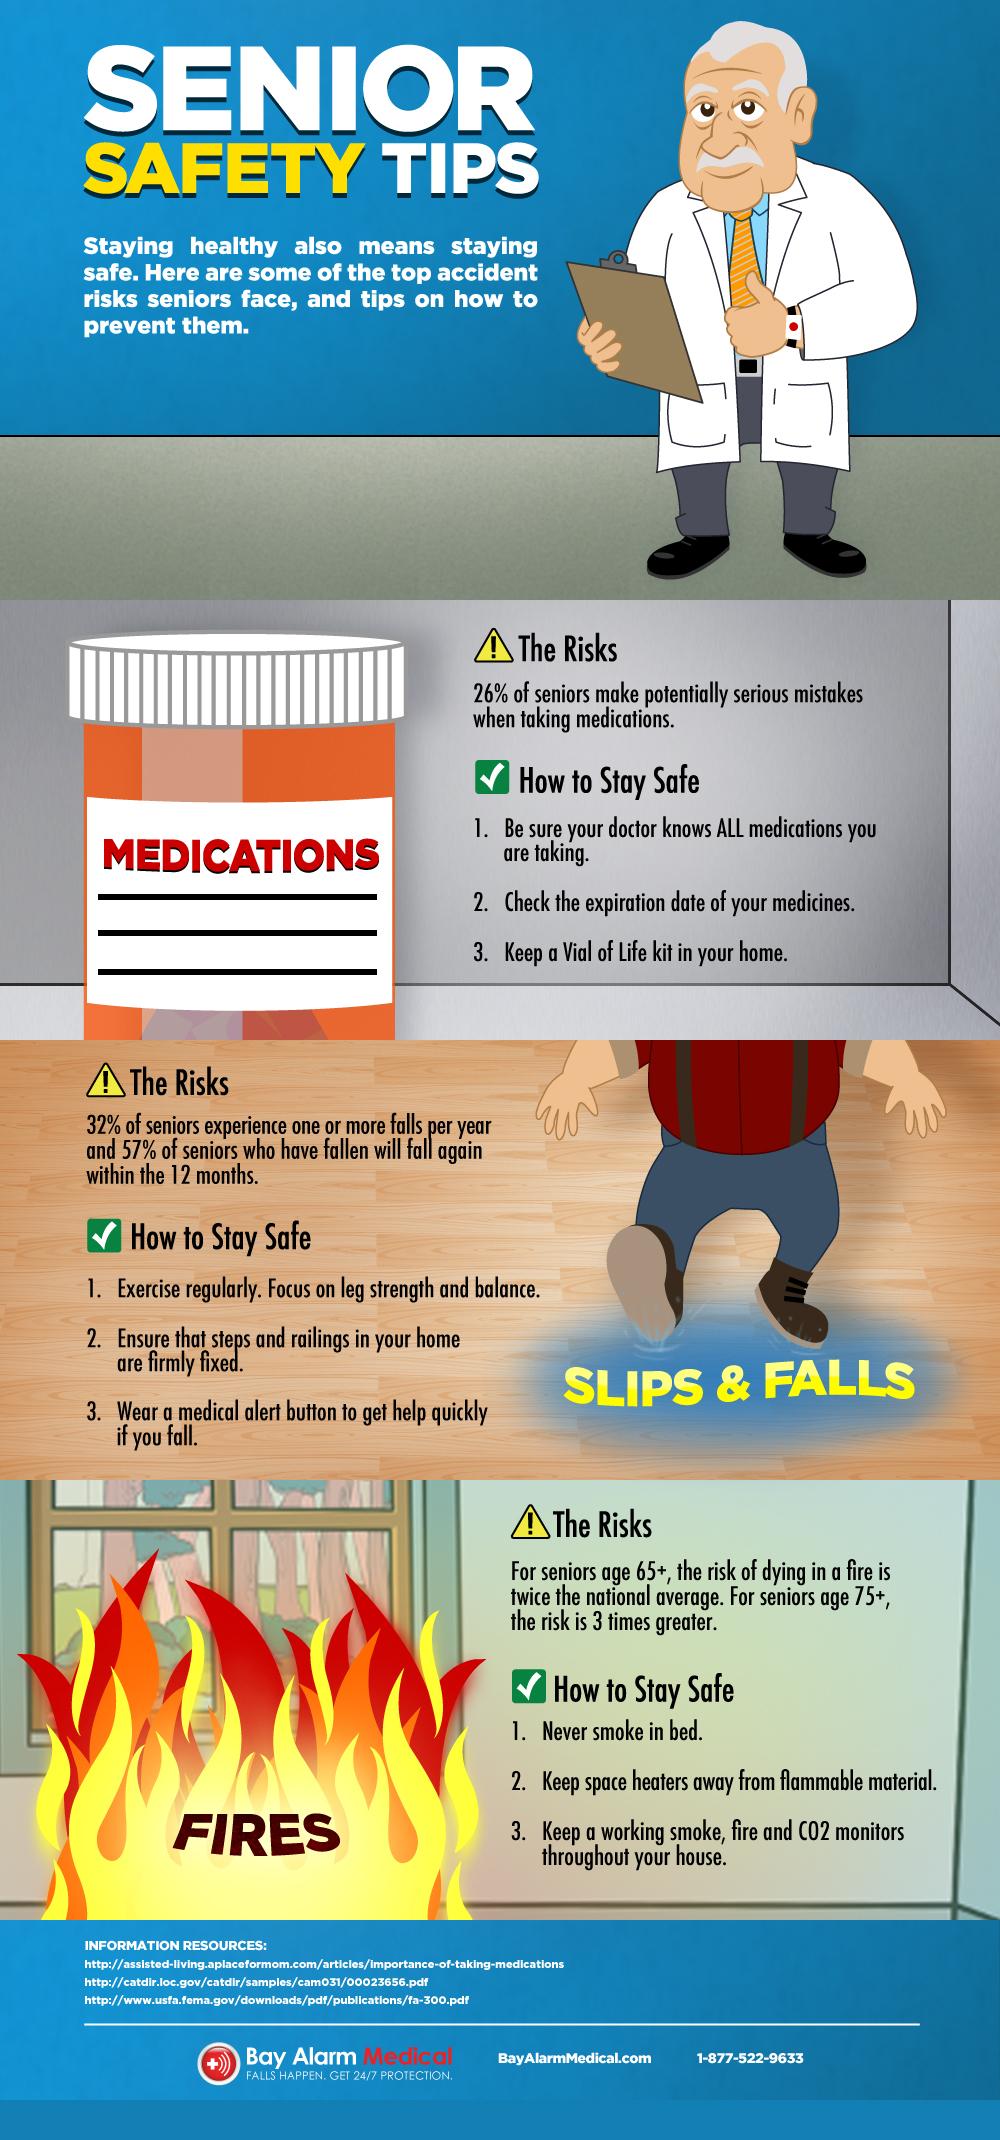 senior-safety-risks--tips-for-staying-safe_51895a624ba88